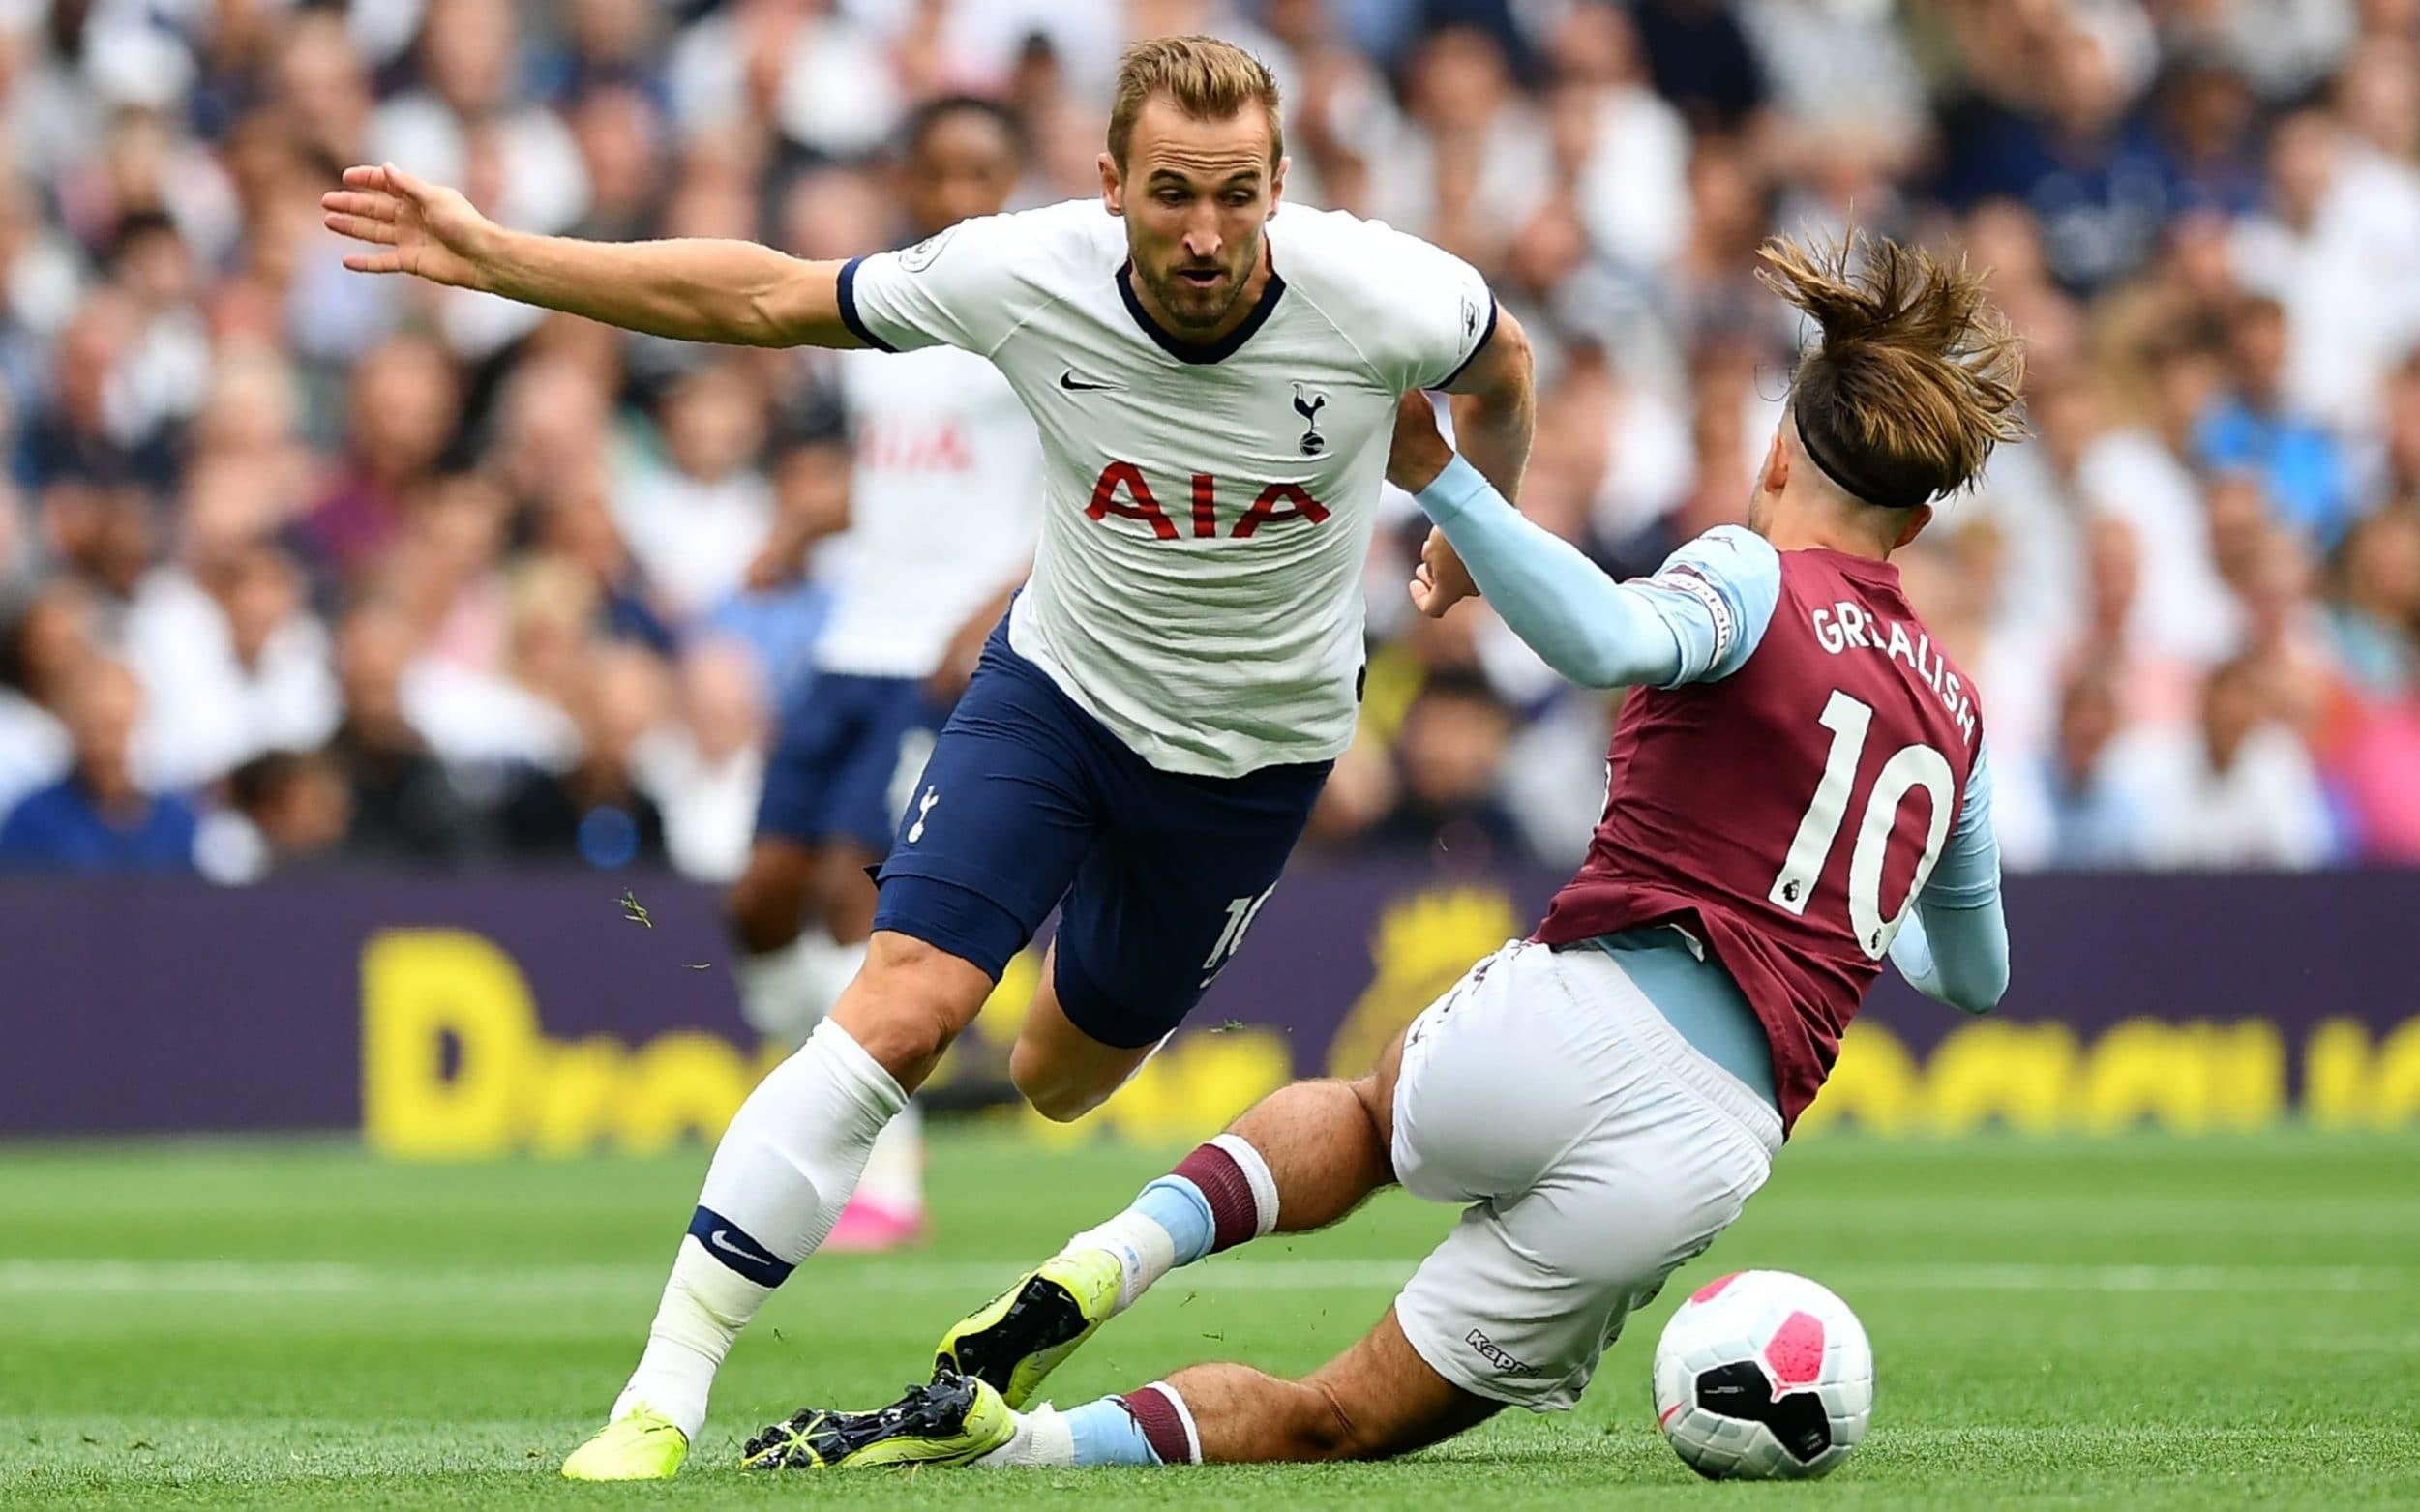 Soi kèo Aston Villa vs Tottenham